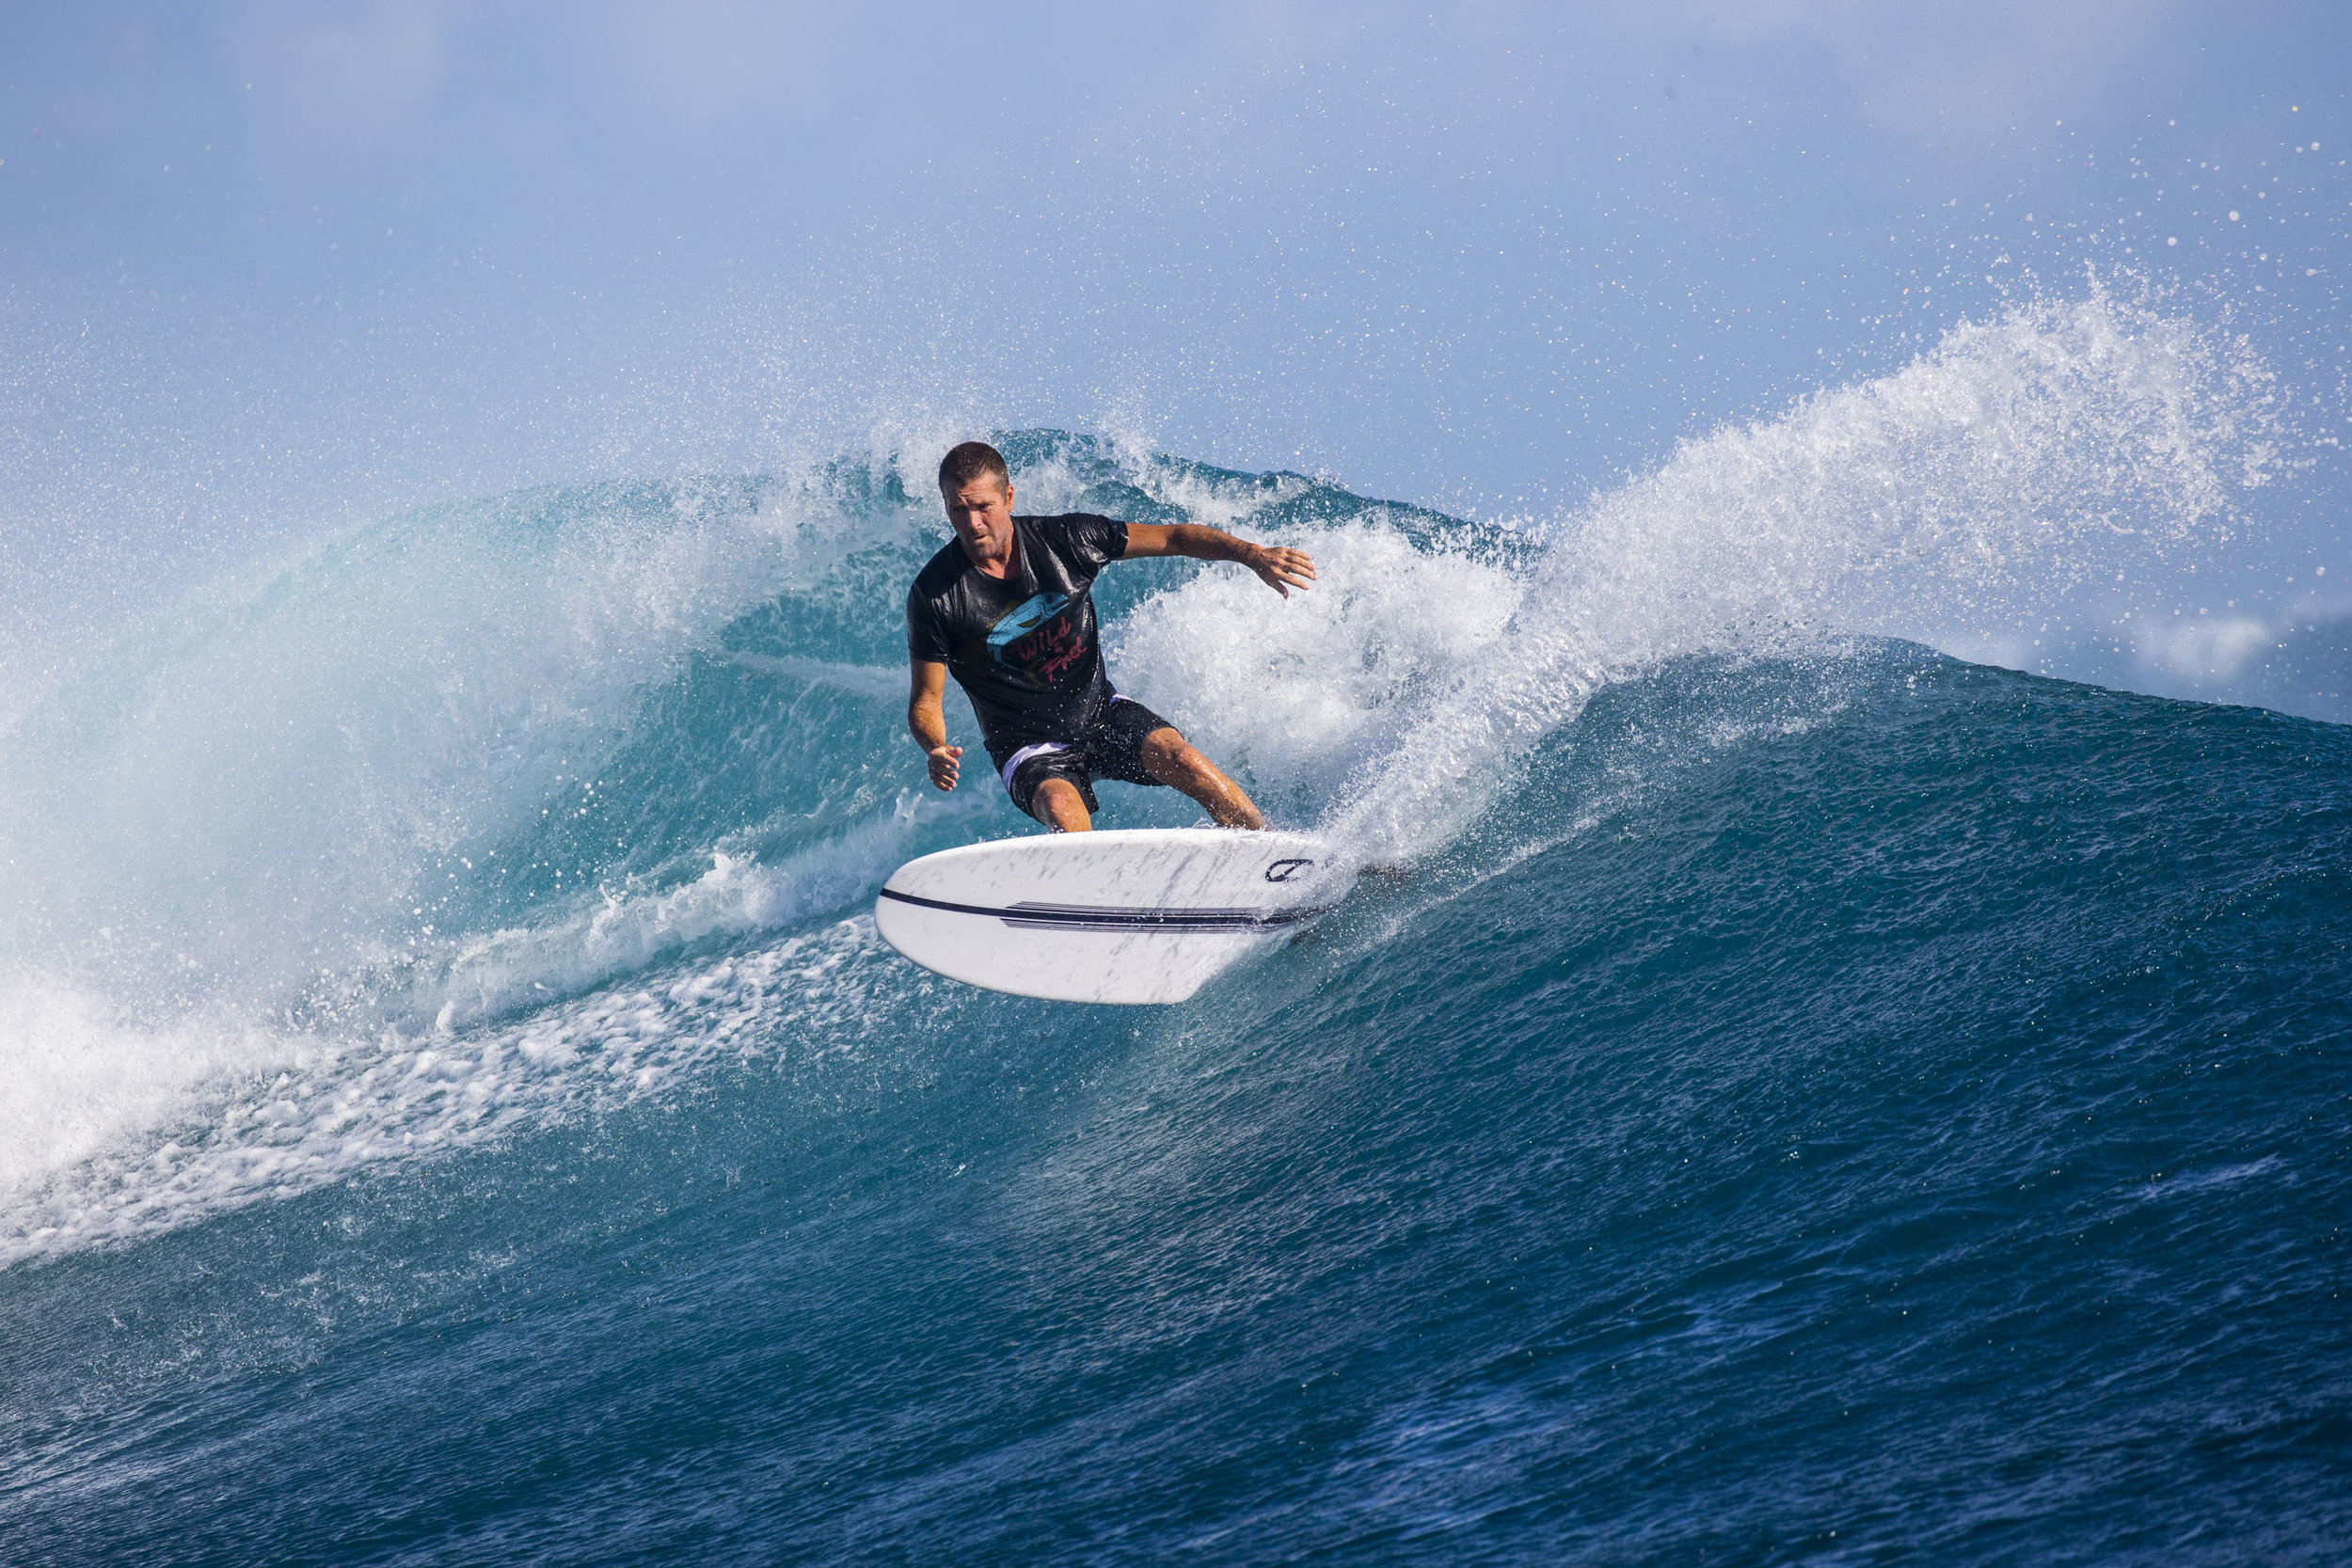 Pete Evans surfing cloud break in Fiji.